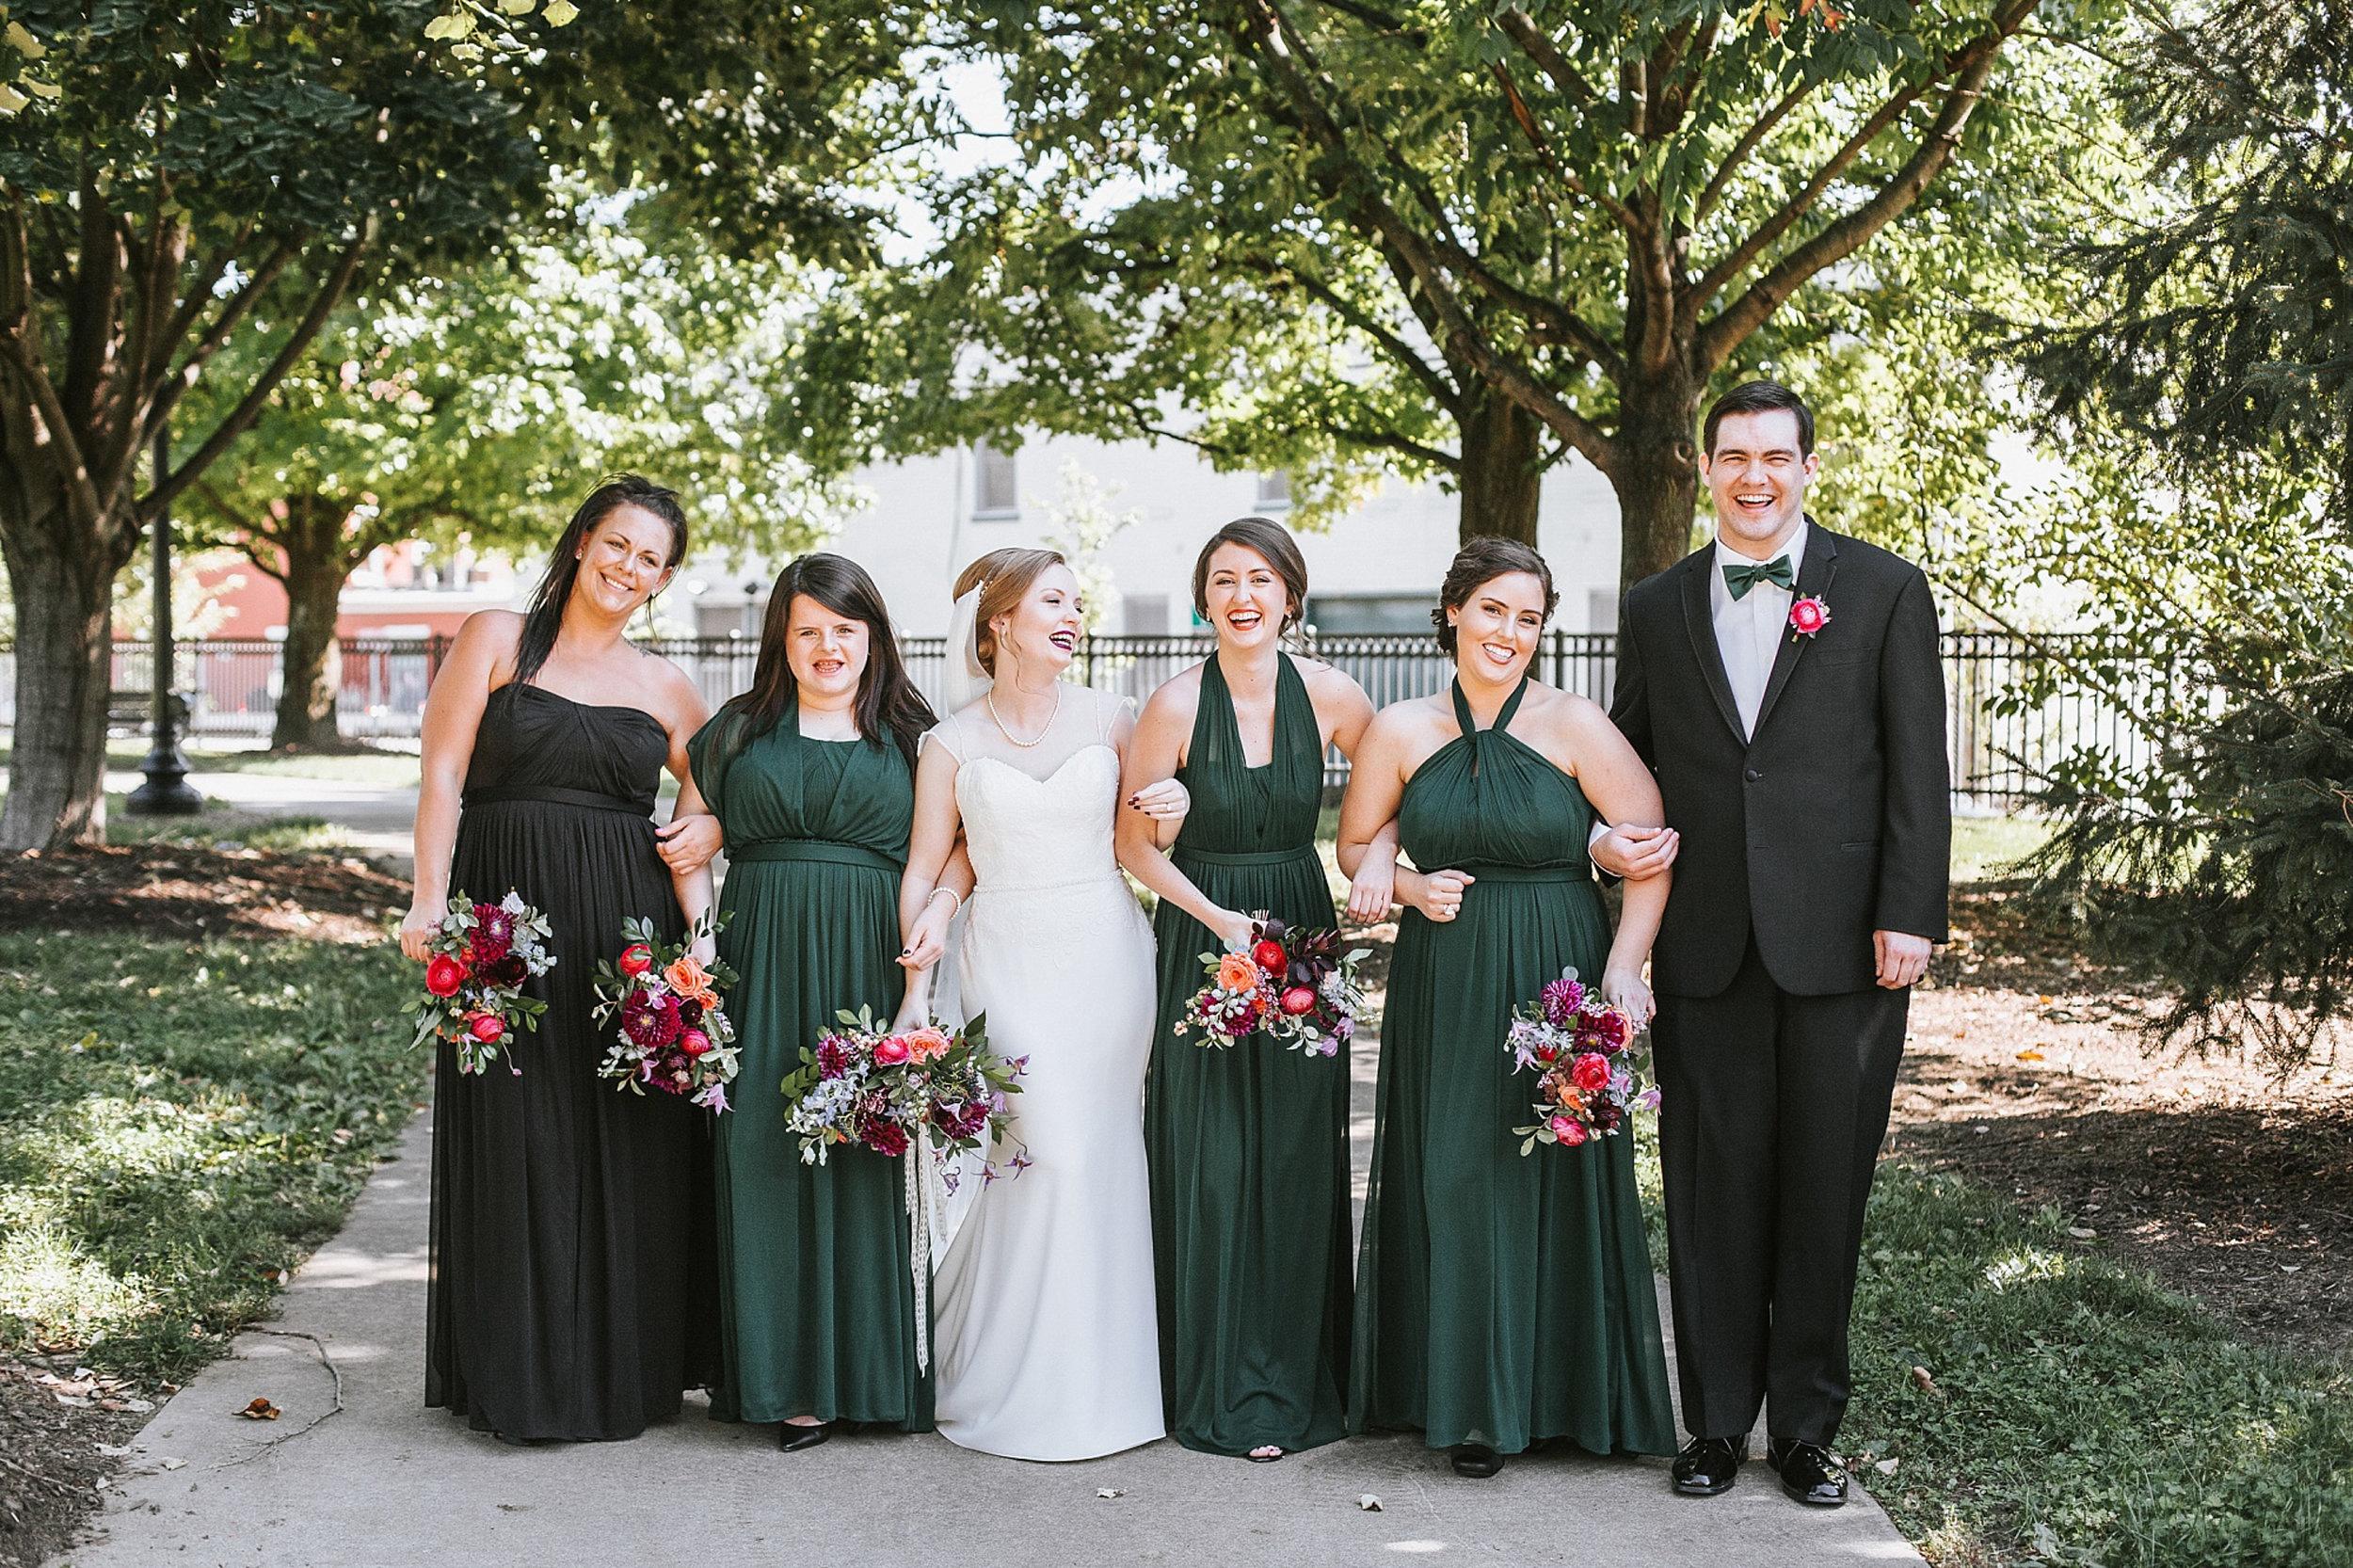 Brooke Townsend Photography - Ohio Wedding Photographer-84.jpg